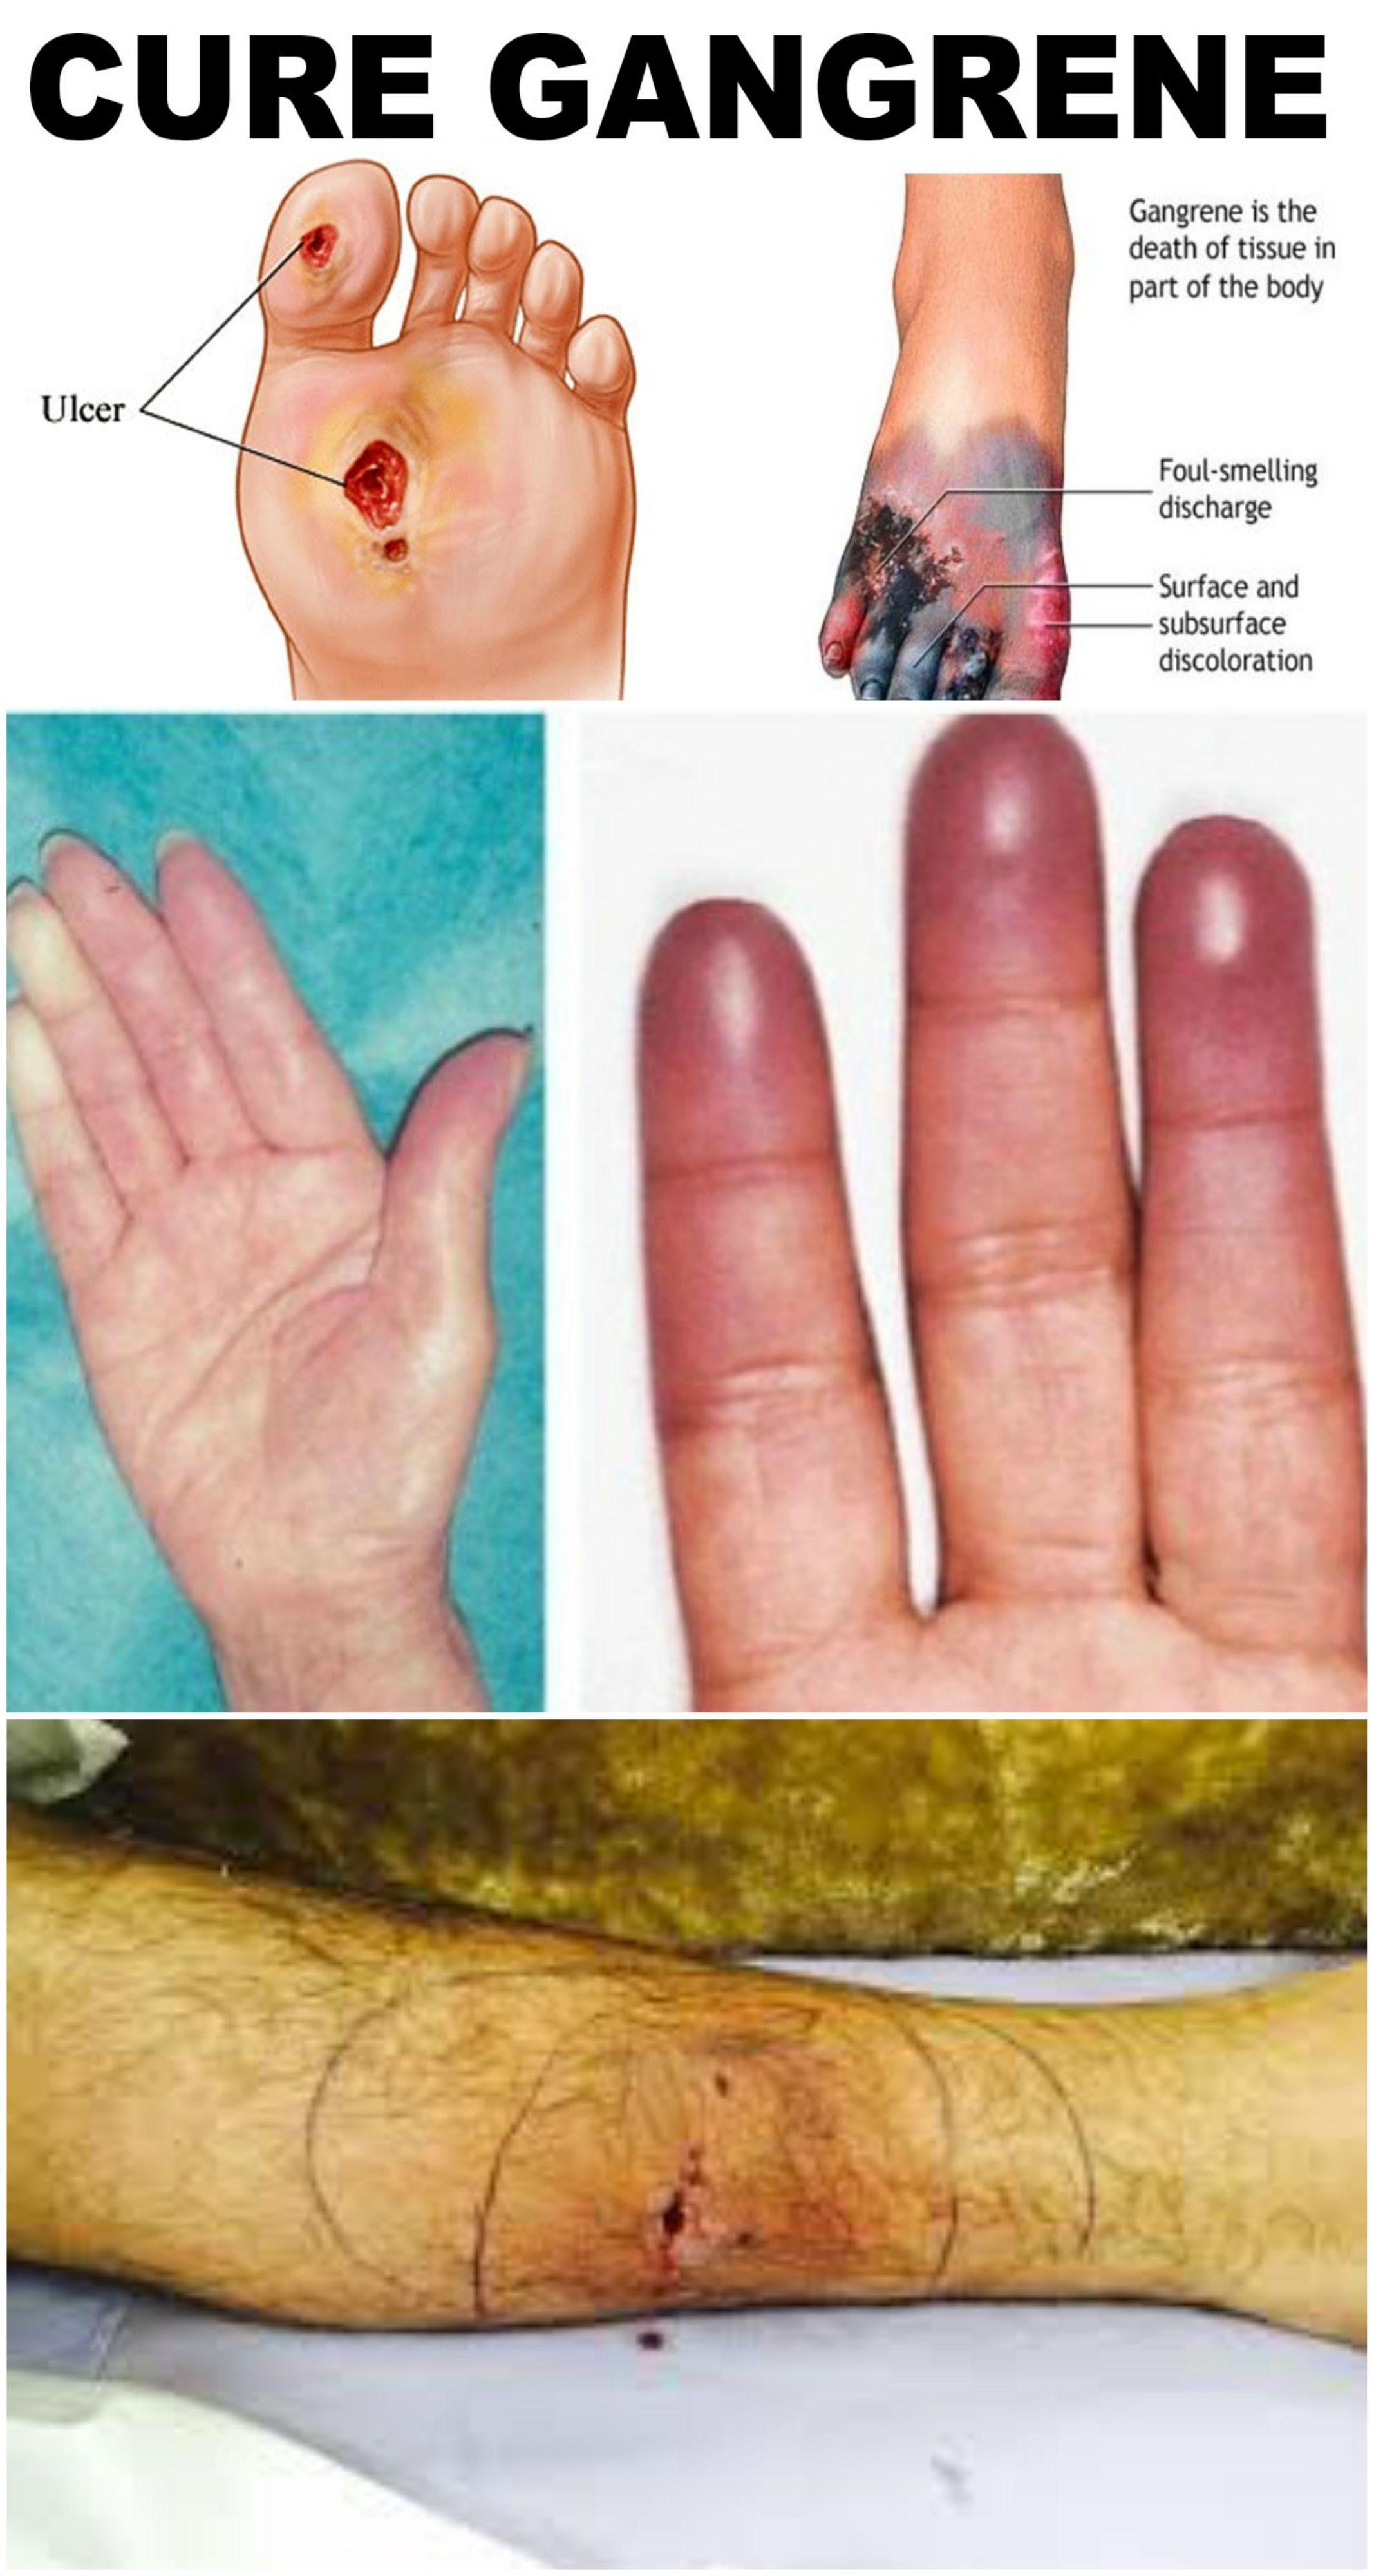 Gangrene anxiety. How to heal her